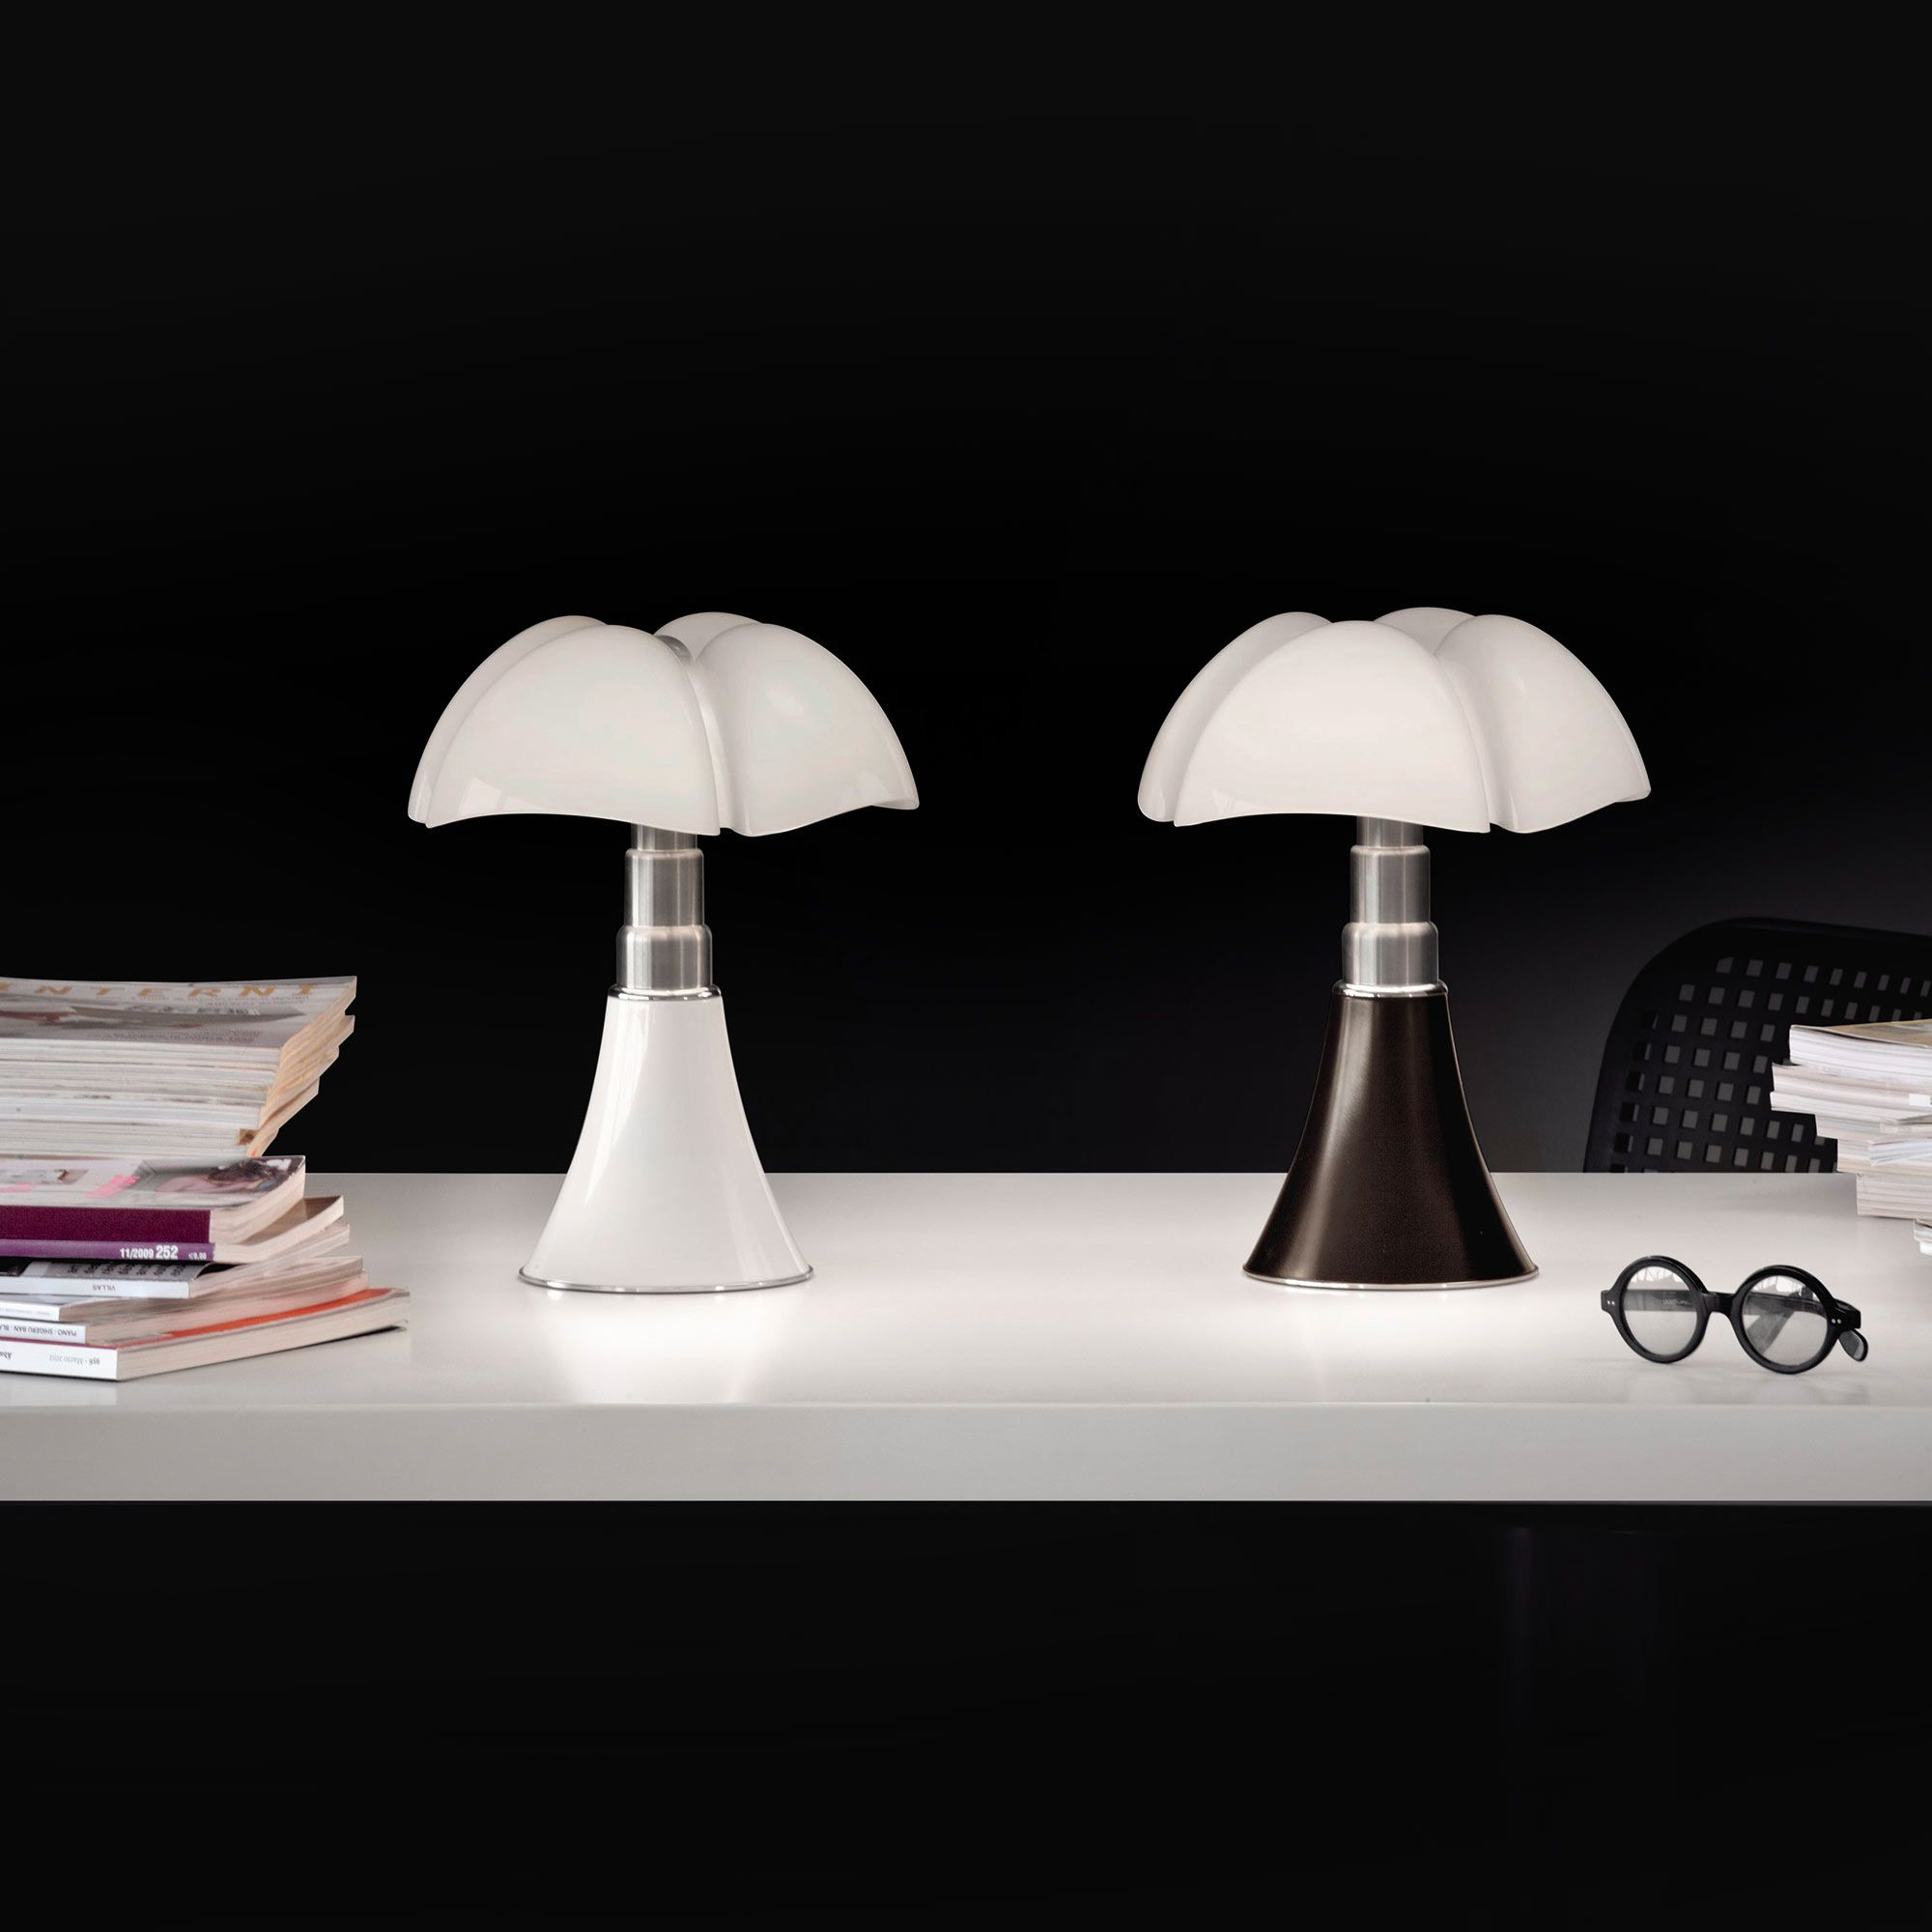 la mythique pipistrello en mod le mini par martinelli luce bureau lampe pipistrello mini. Black Bedroom Furniture Sets. Home Design Ideas